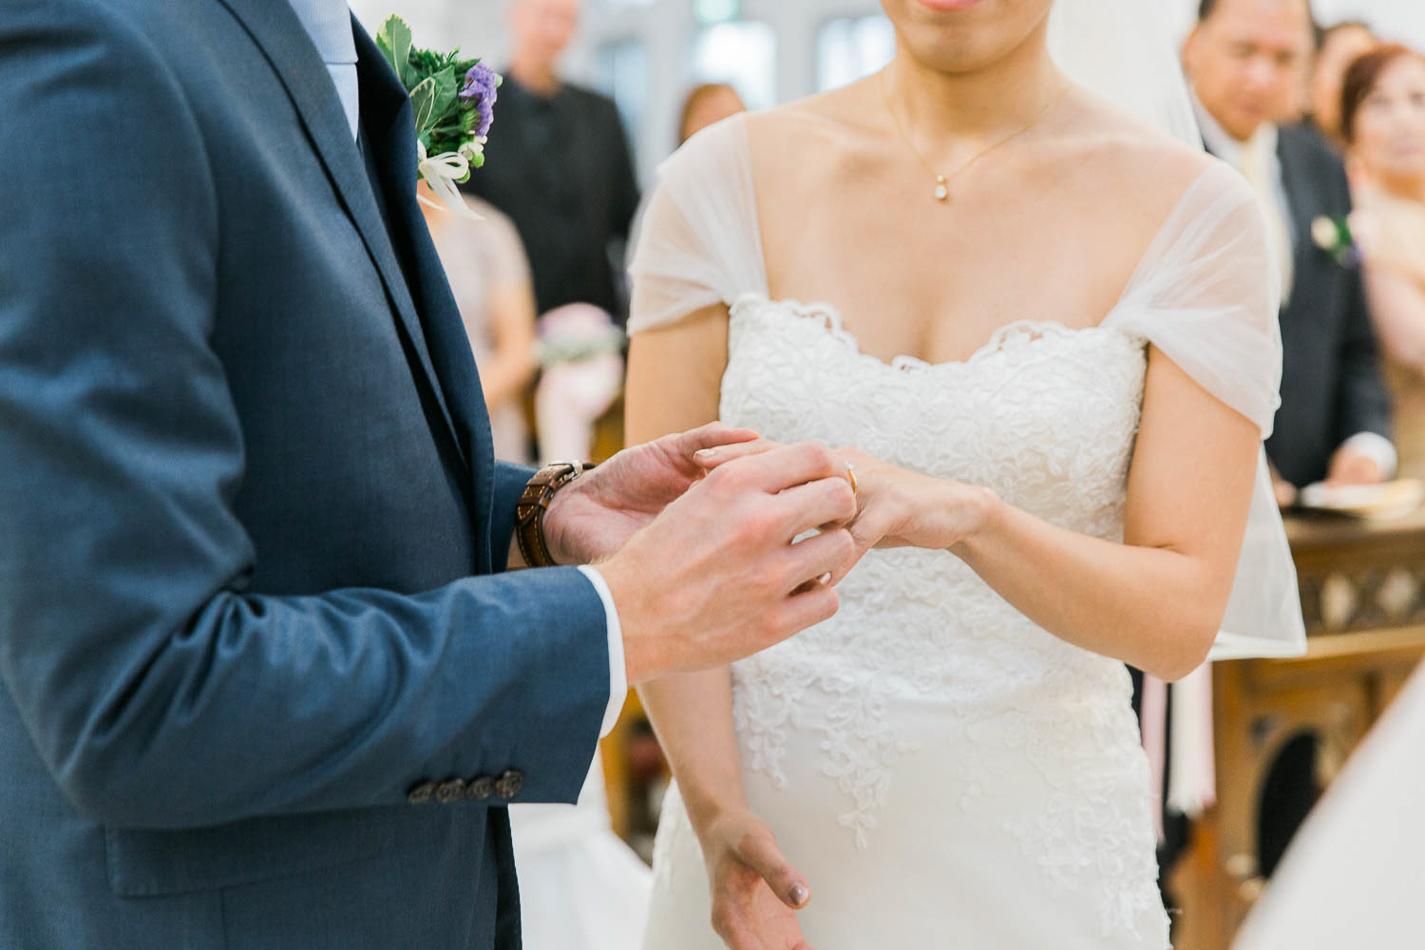 wedding-photographer-singapore-film-photographer-chen-sands-Anglea-wedding-CSPBLOG-15.jpg